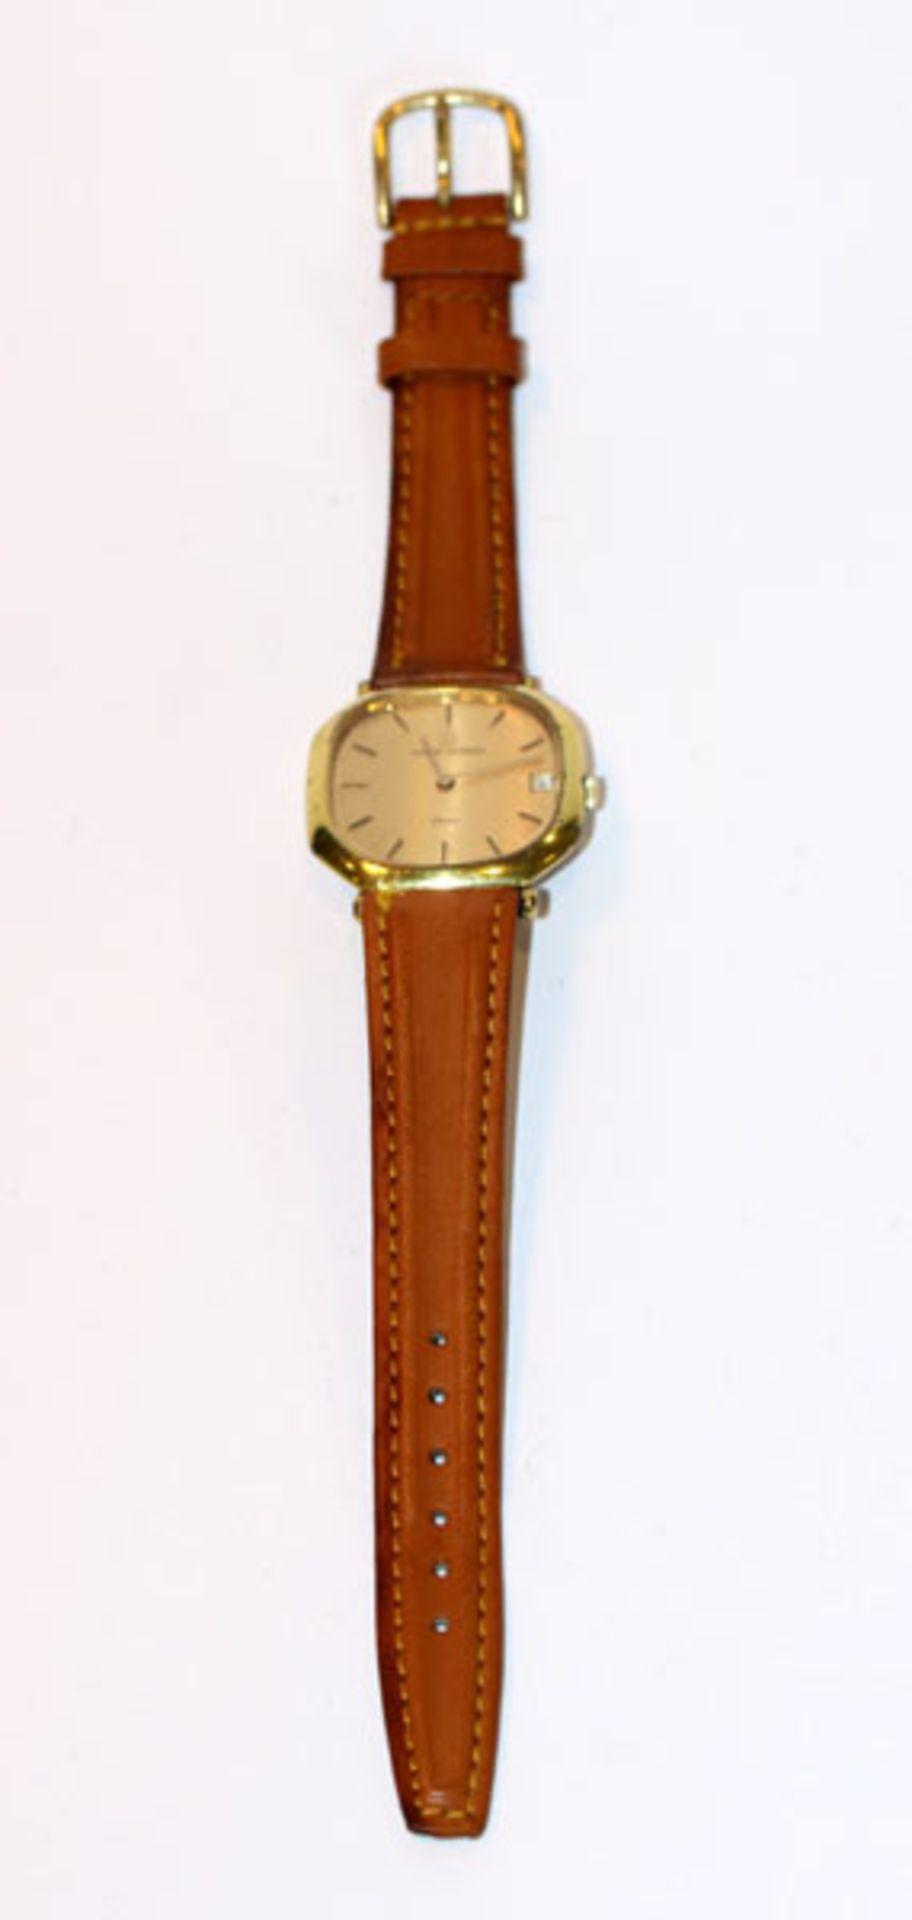 Los 20 - Michel Herbelin, Paris, Armbanduhr, mechanisches Werk, intakt, an braunem Armband, Tragespuren